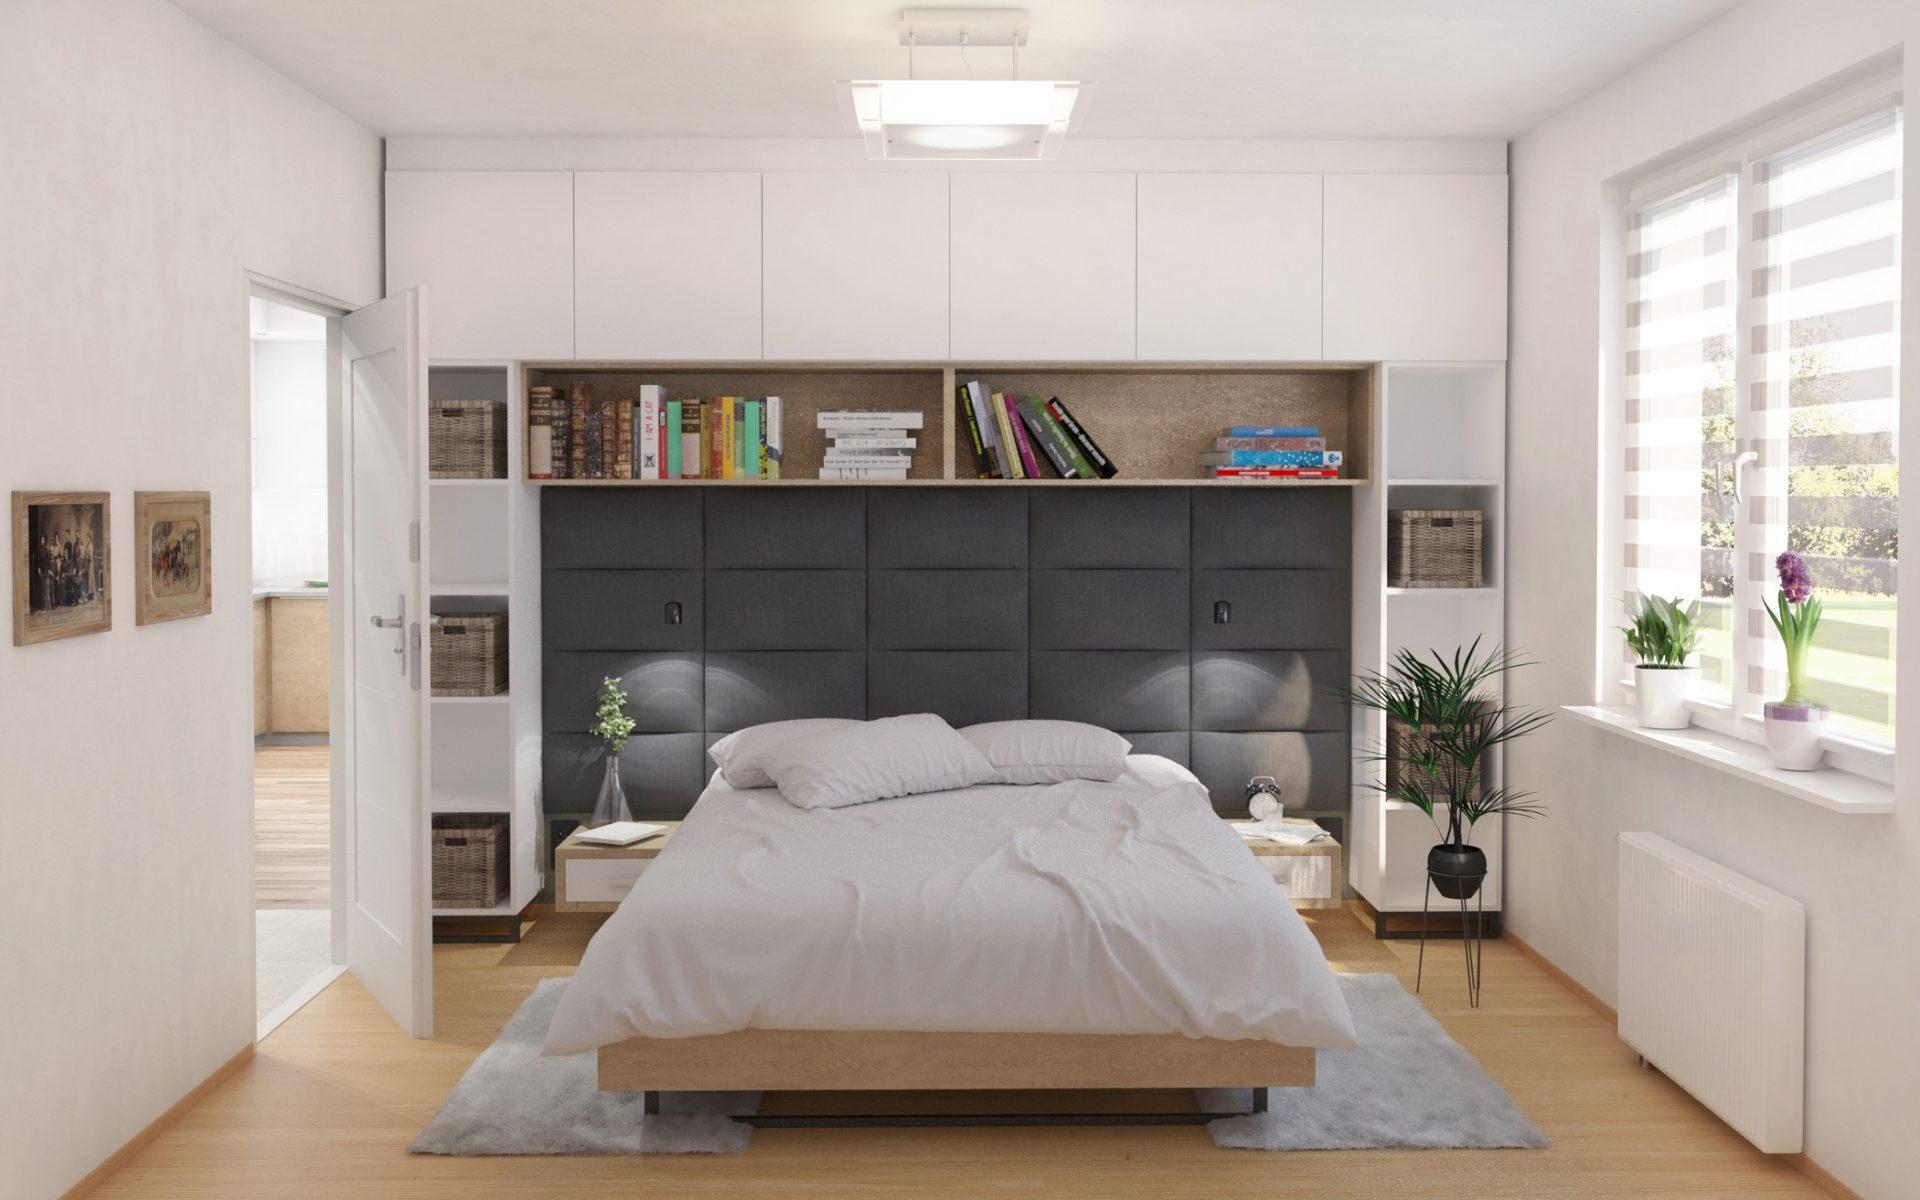 sypialnia projekt architekt katowice